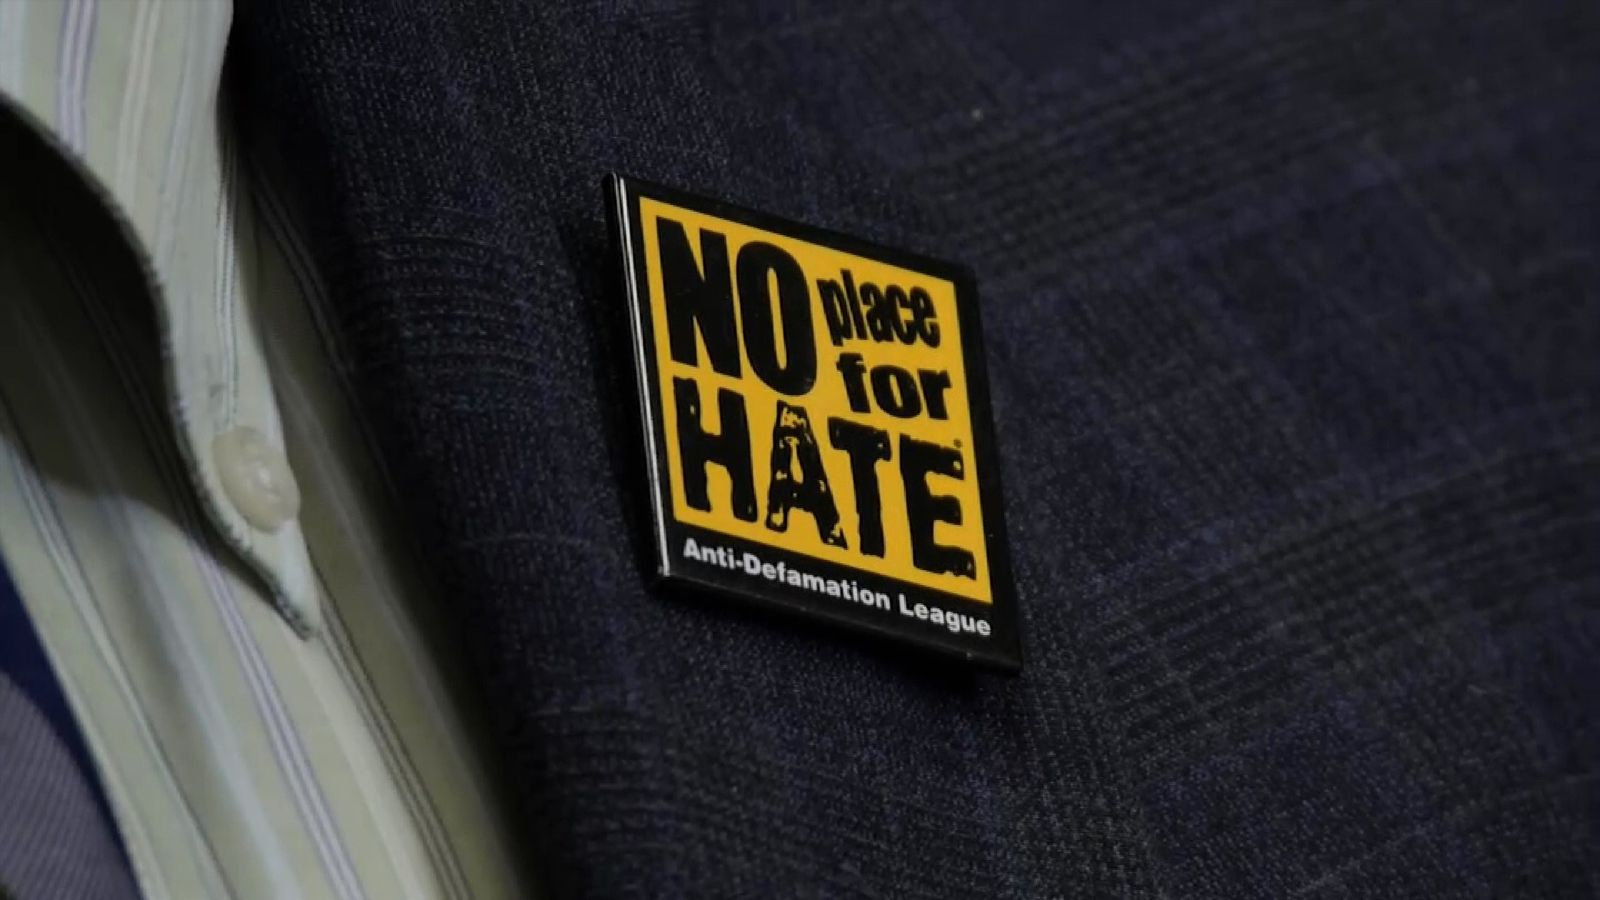 US hate crime surge in wake of Trump win